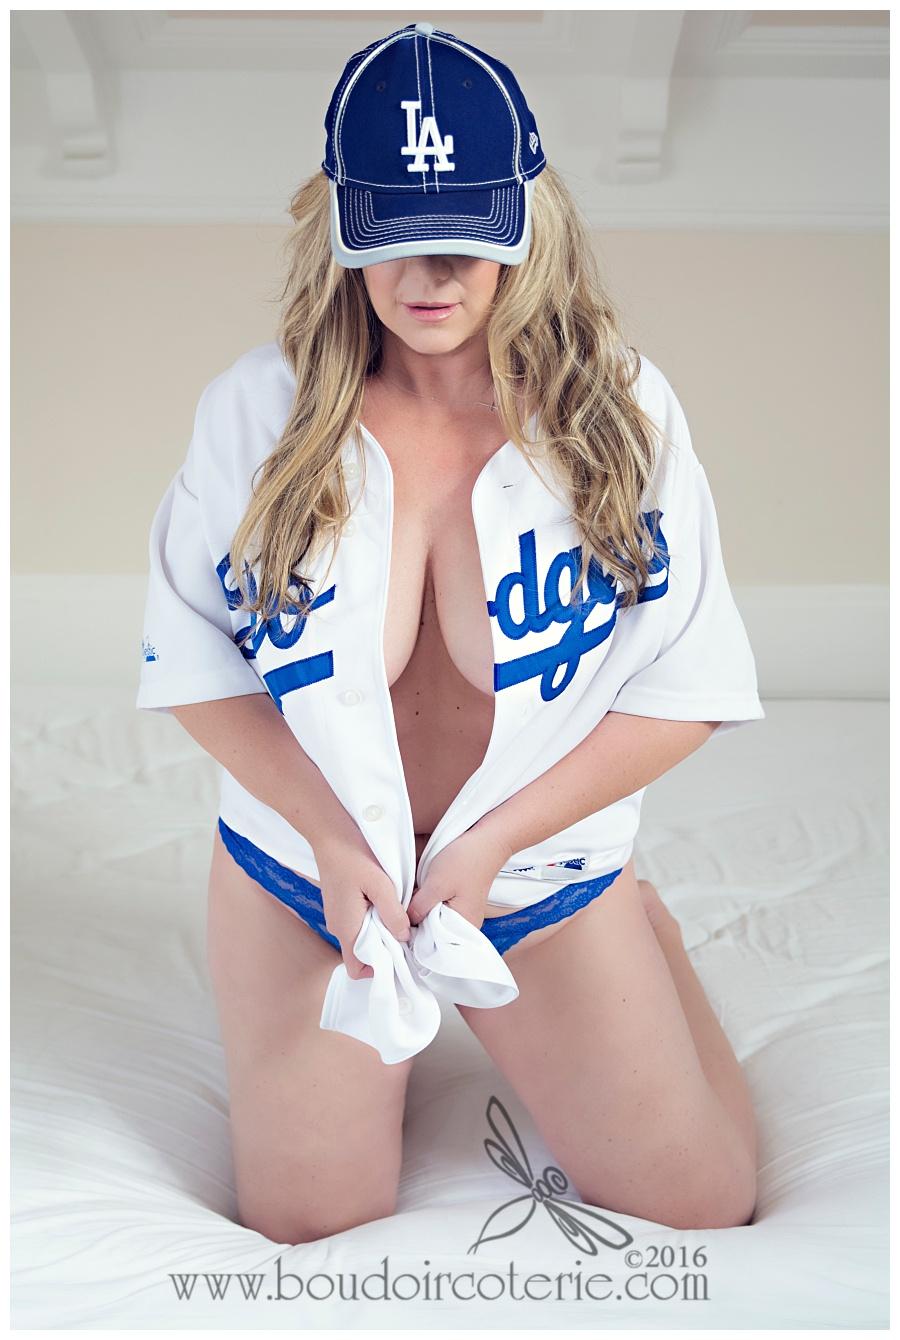 Cute Iphone Wallpapers For Girls Sexy Dodger Baseball Girls 20665 Loadtve